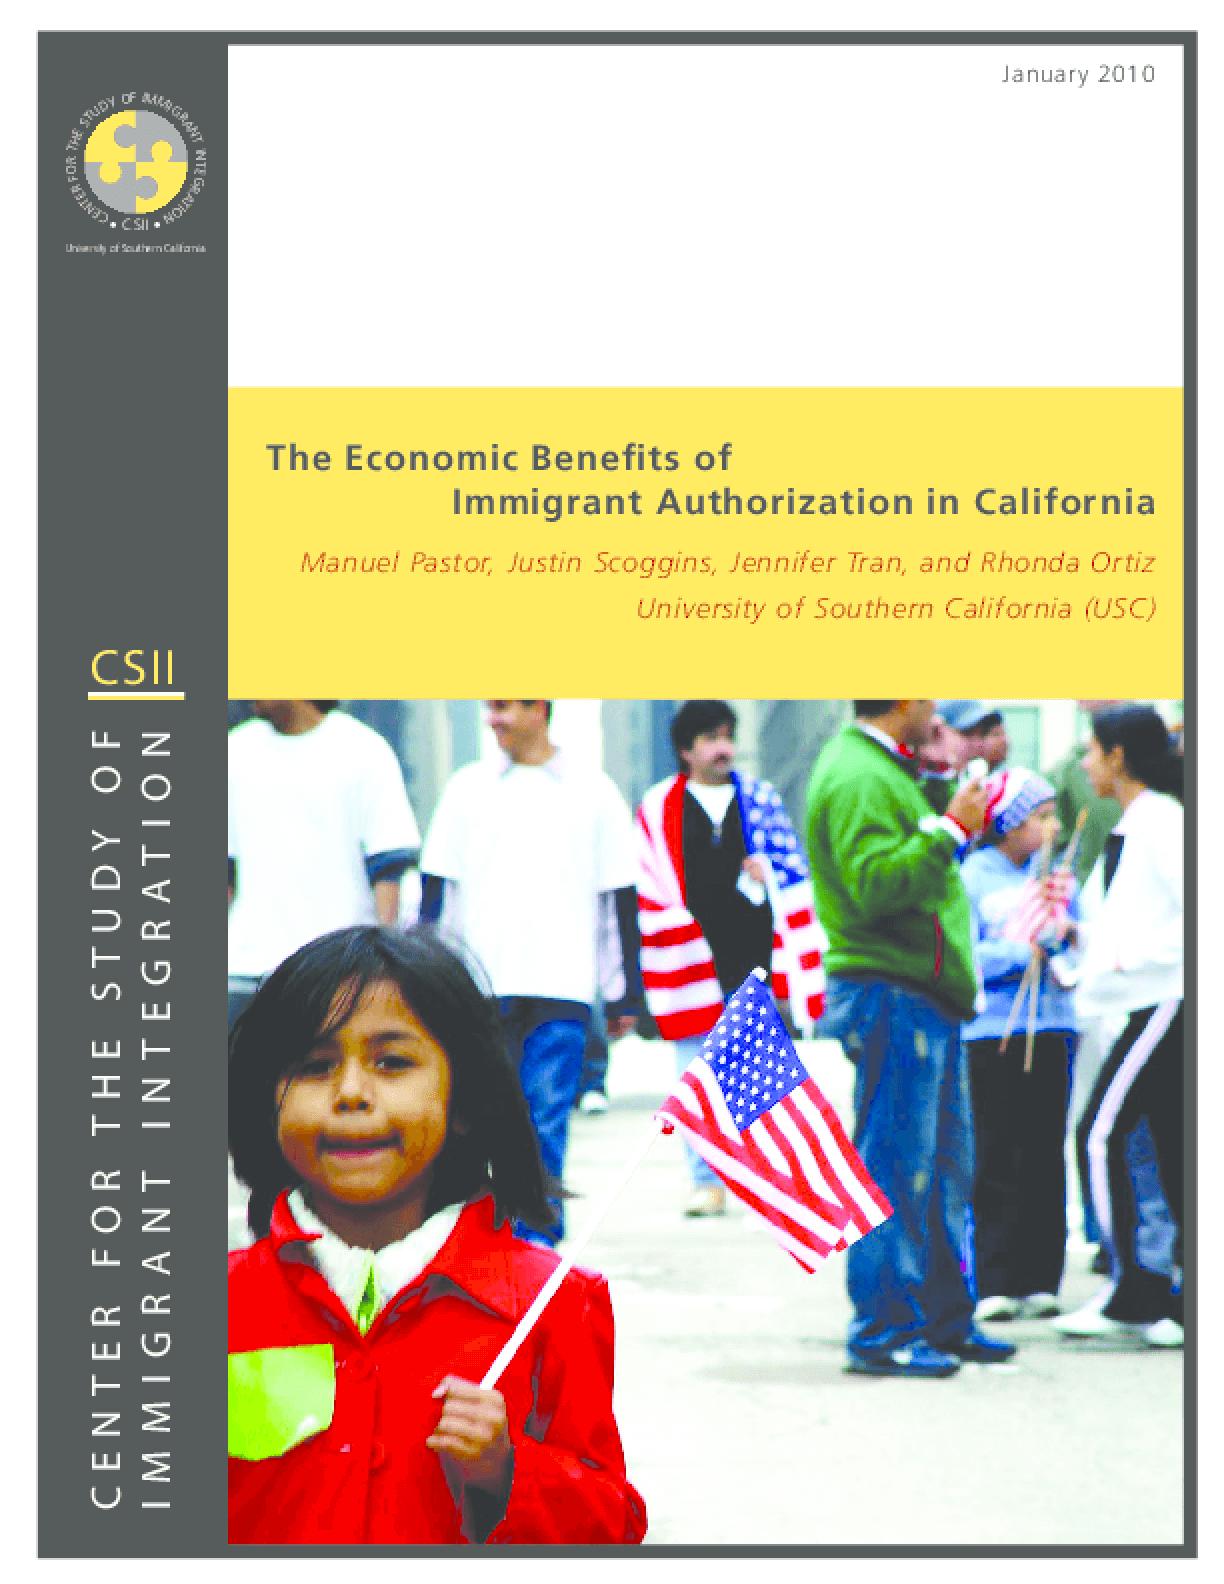 The Economic Benefits of Immigrant Authorization in California